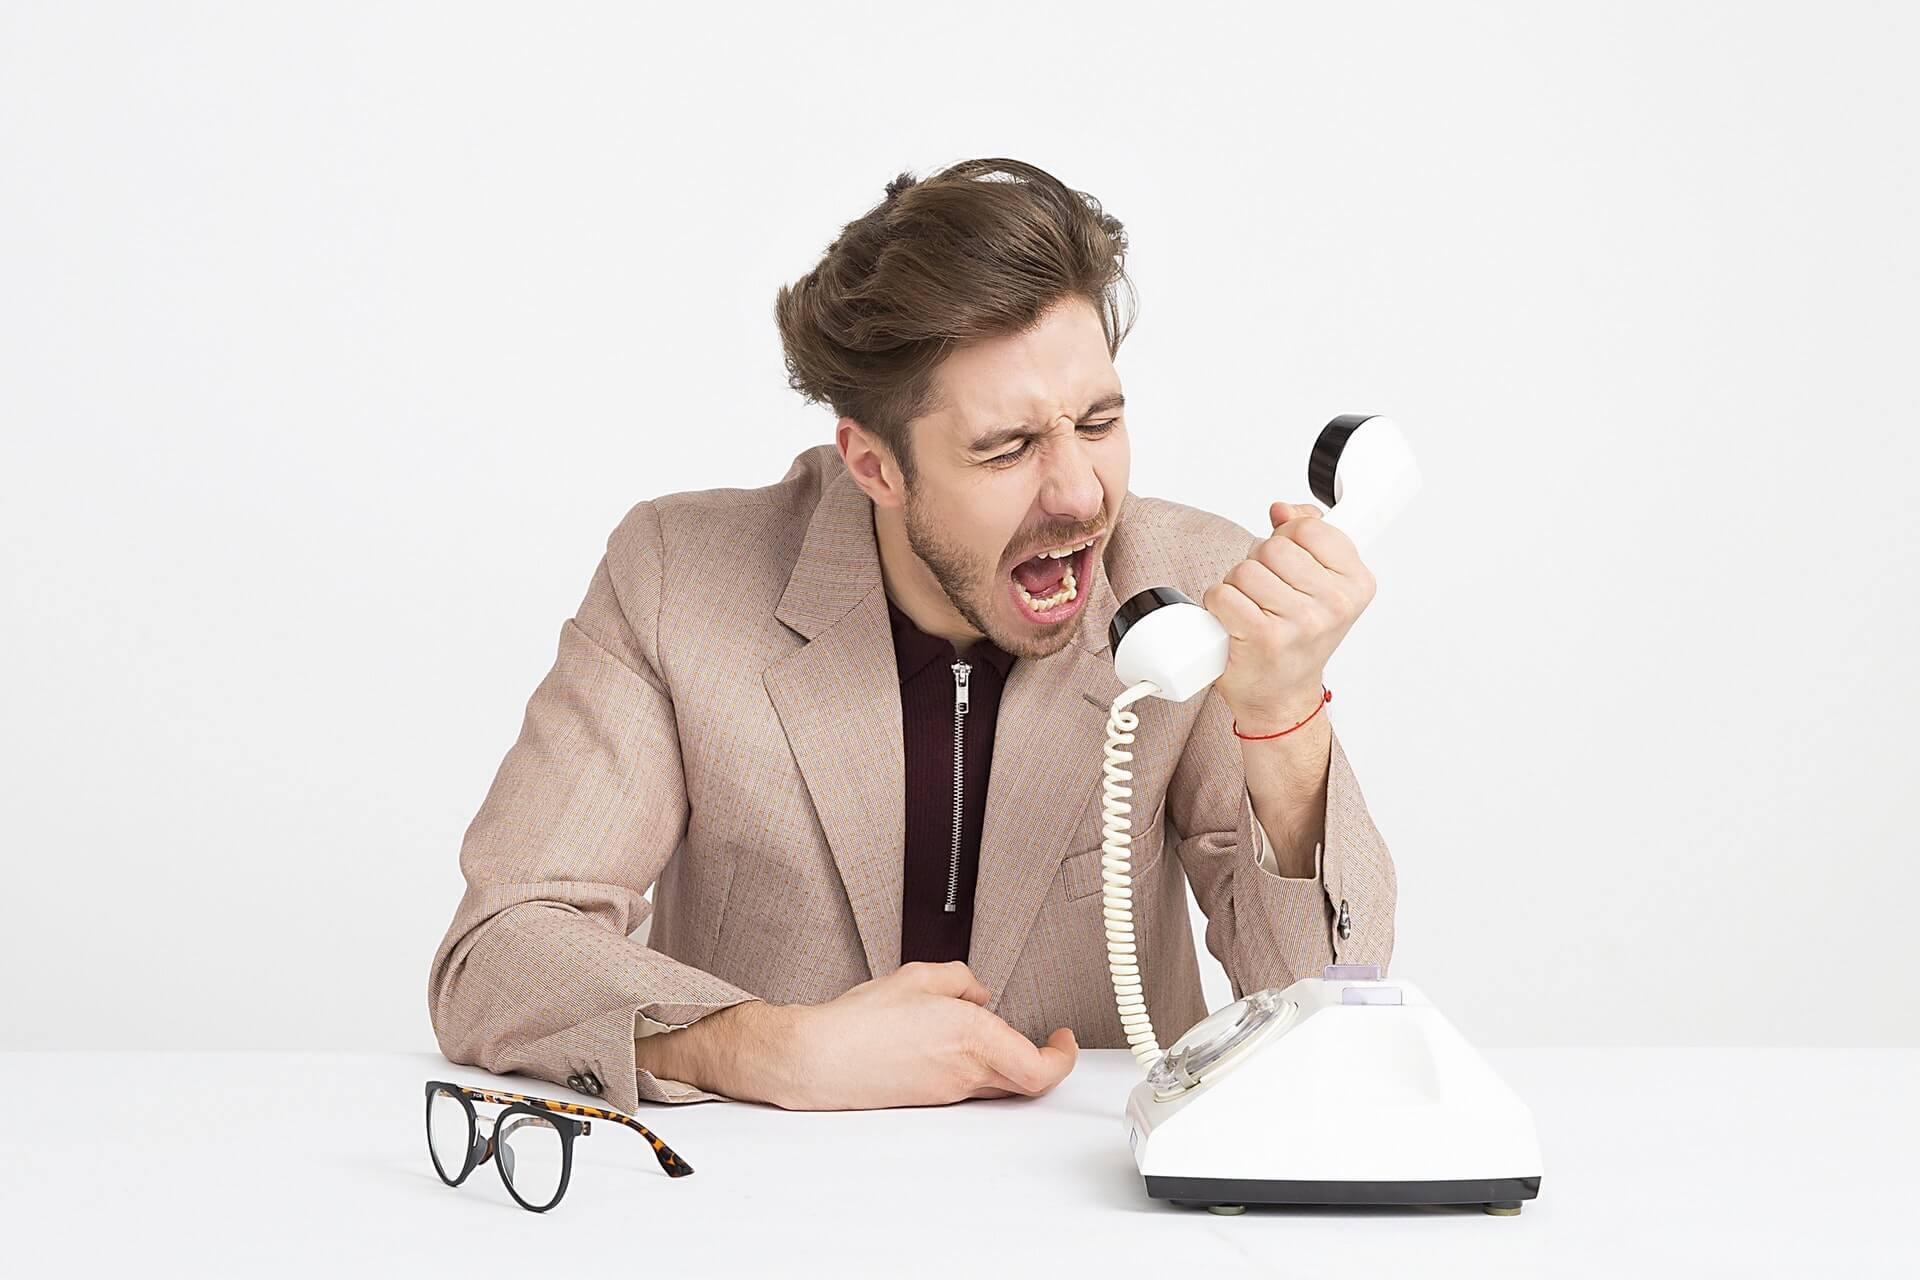 Stop Unwanted Phone Calls on Landline